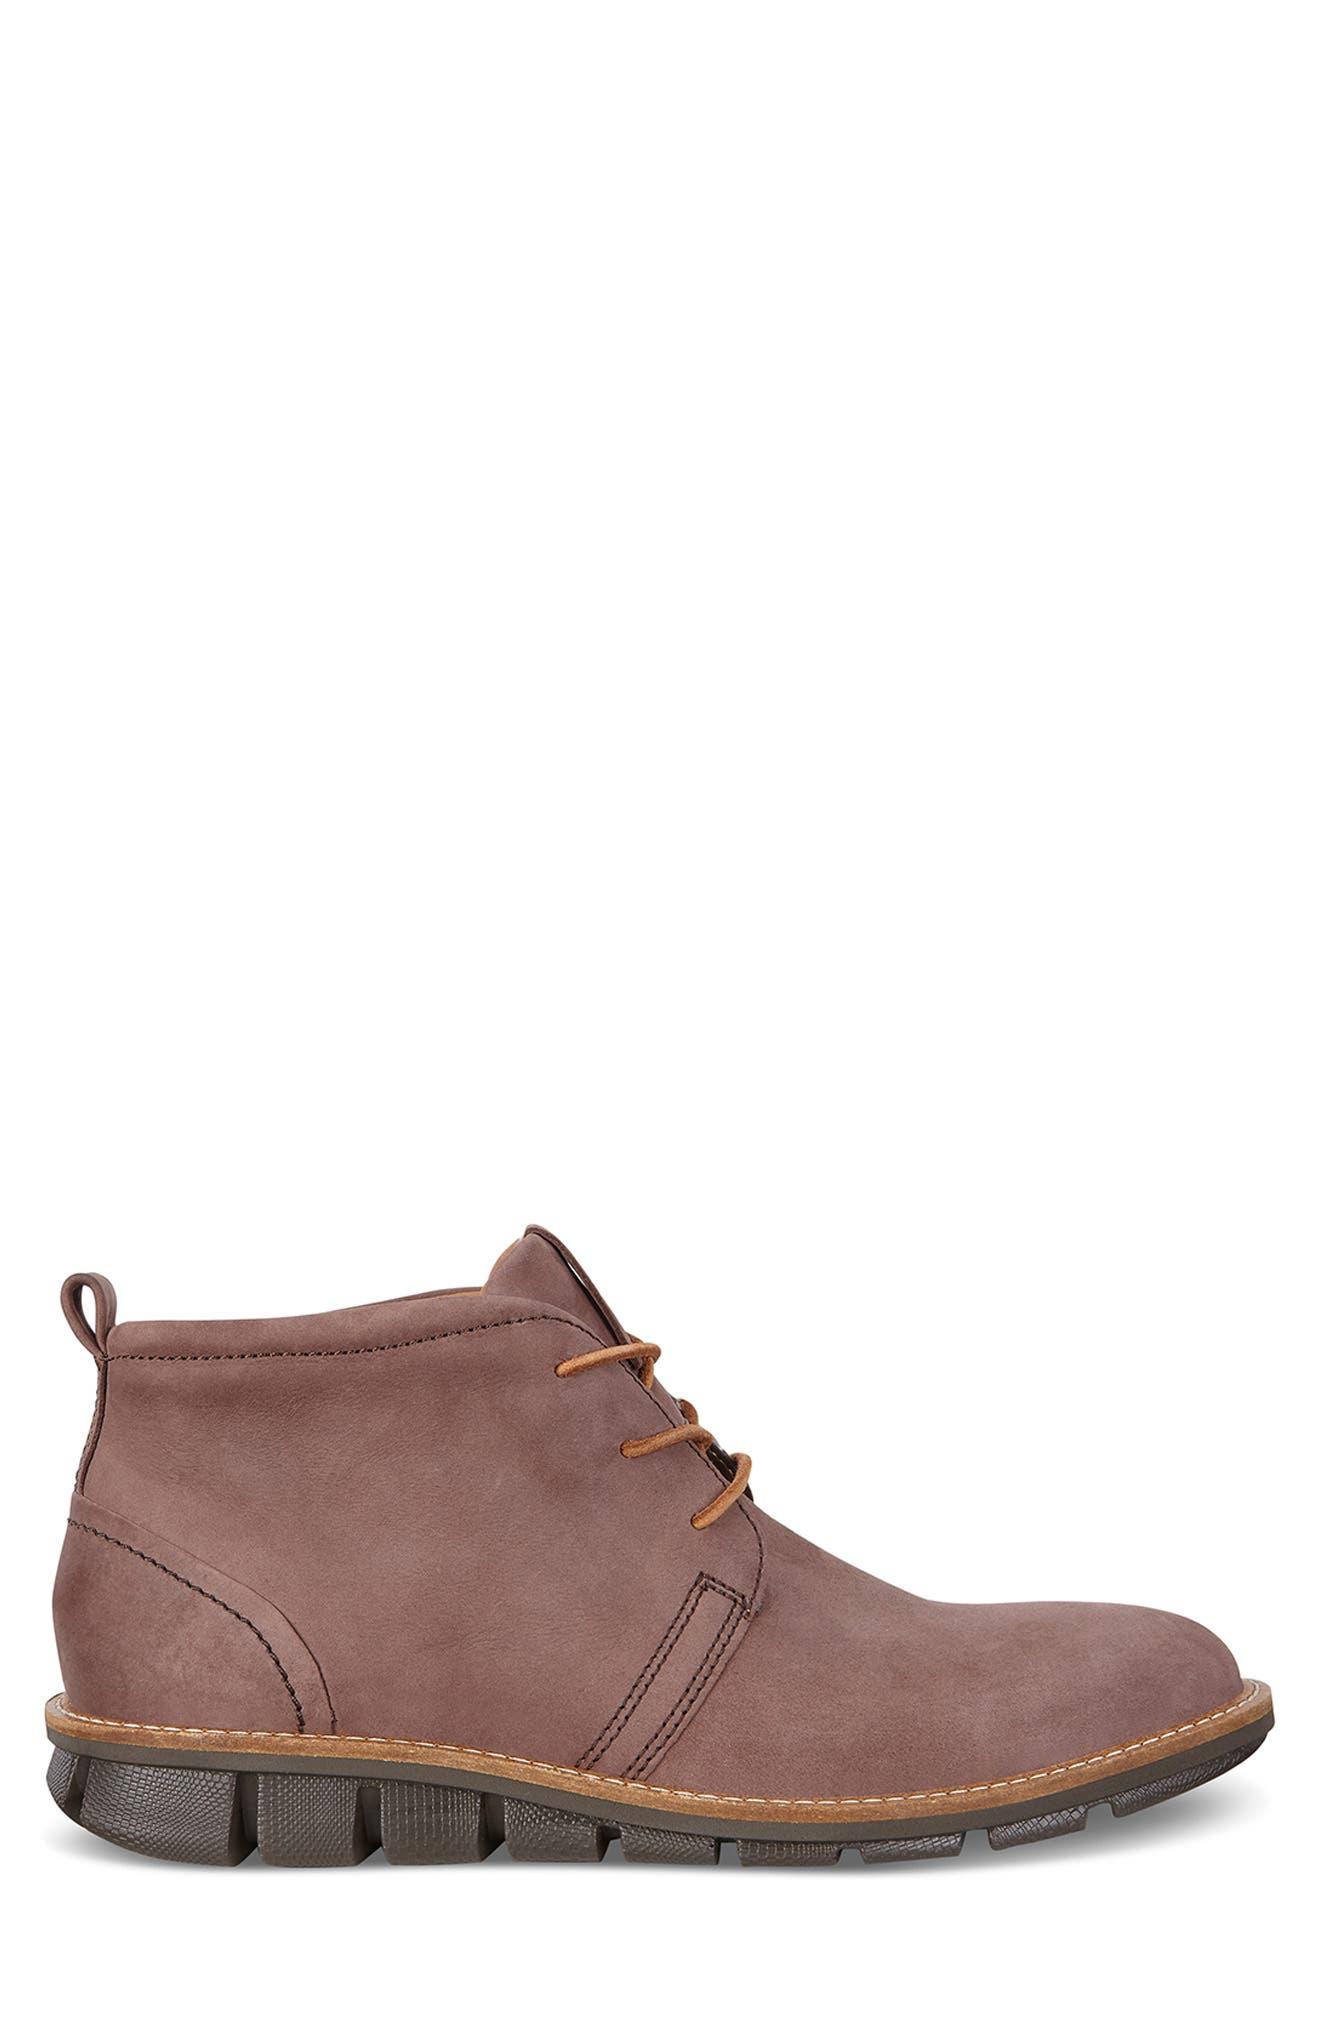 'Jeremy Hybrid' Plain Toe Boot,                             Alternate thumbnail 2, color,                             COFFEE LEATHER